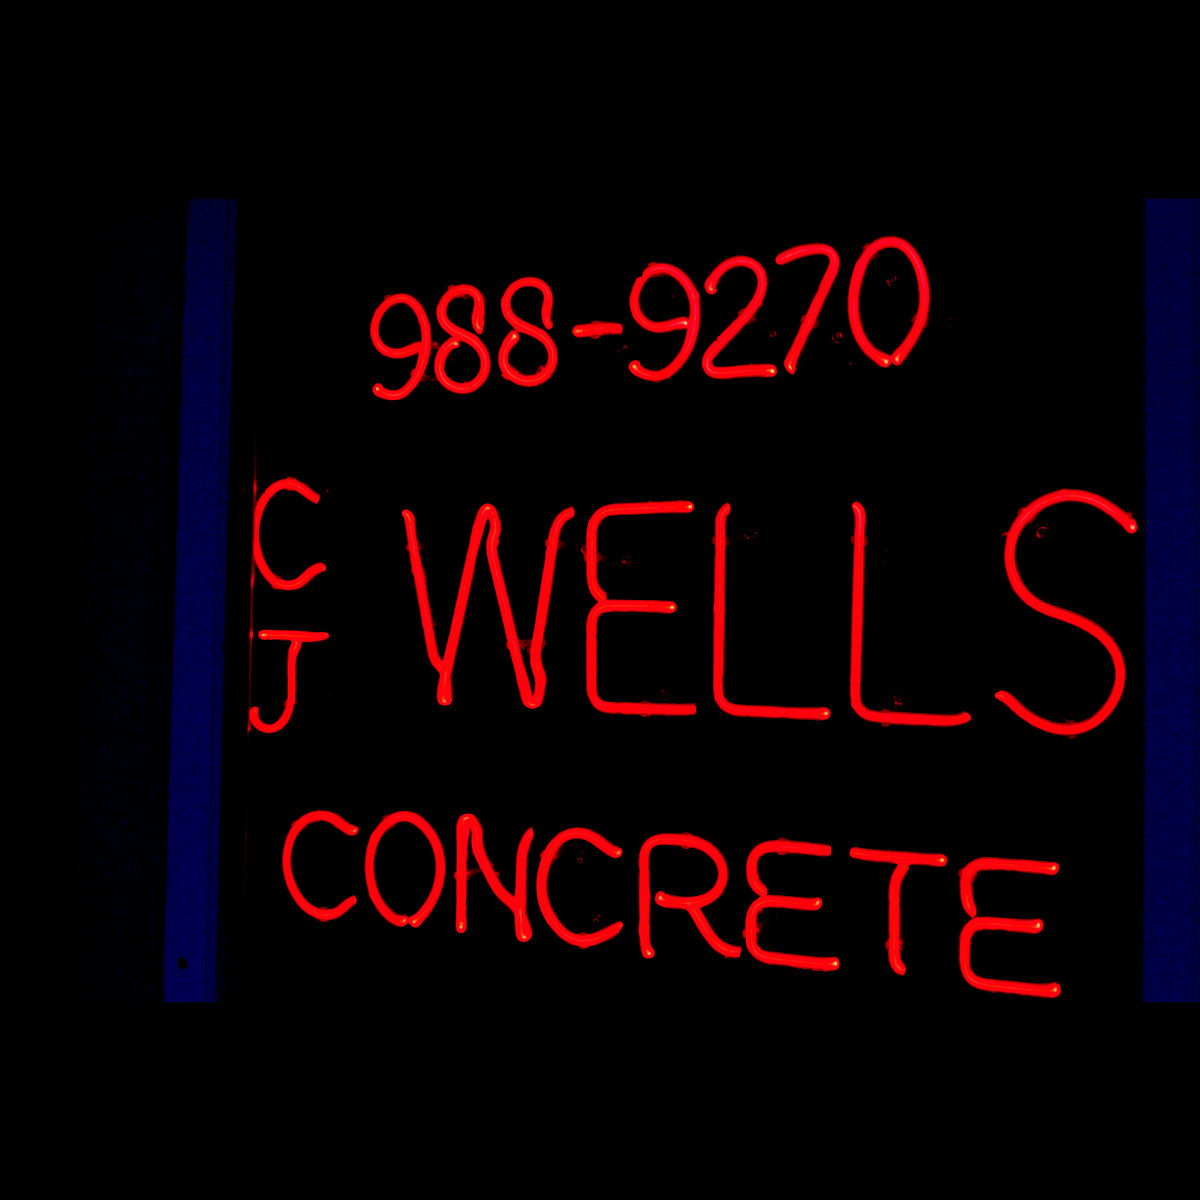 resized C J Wells Concrete.jpg